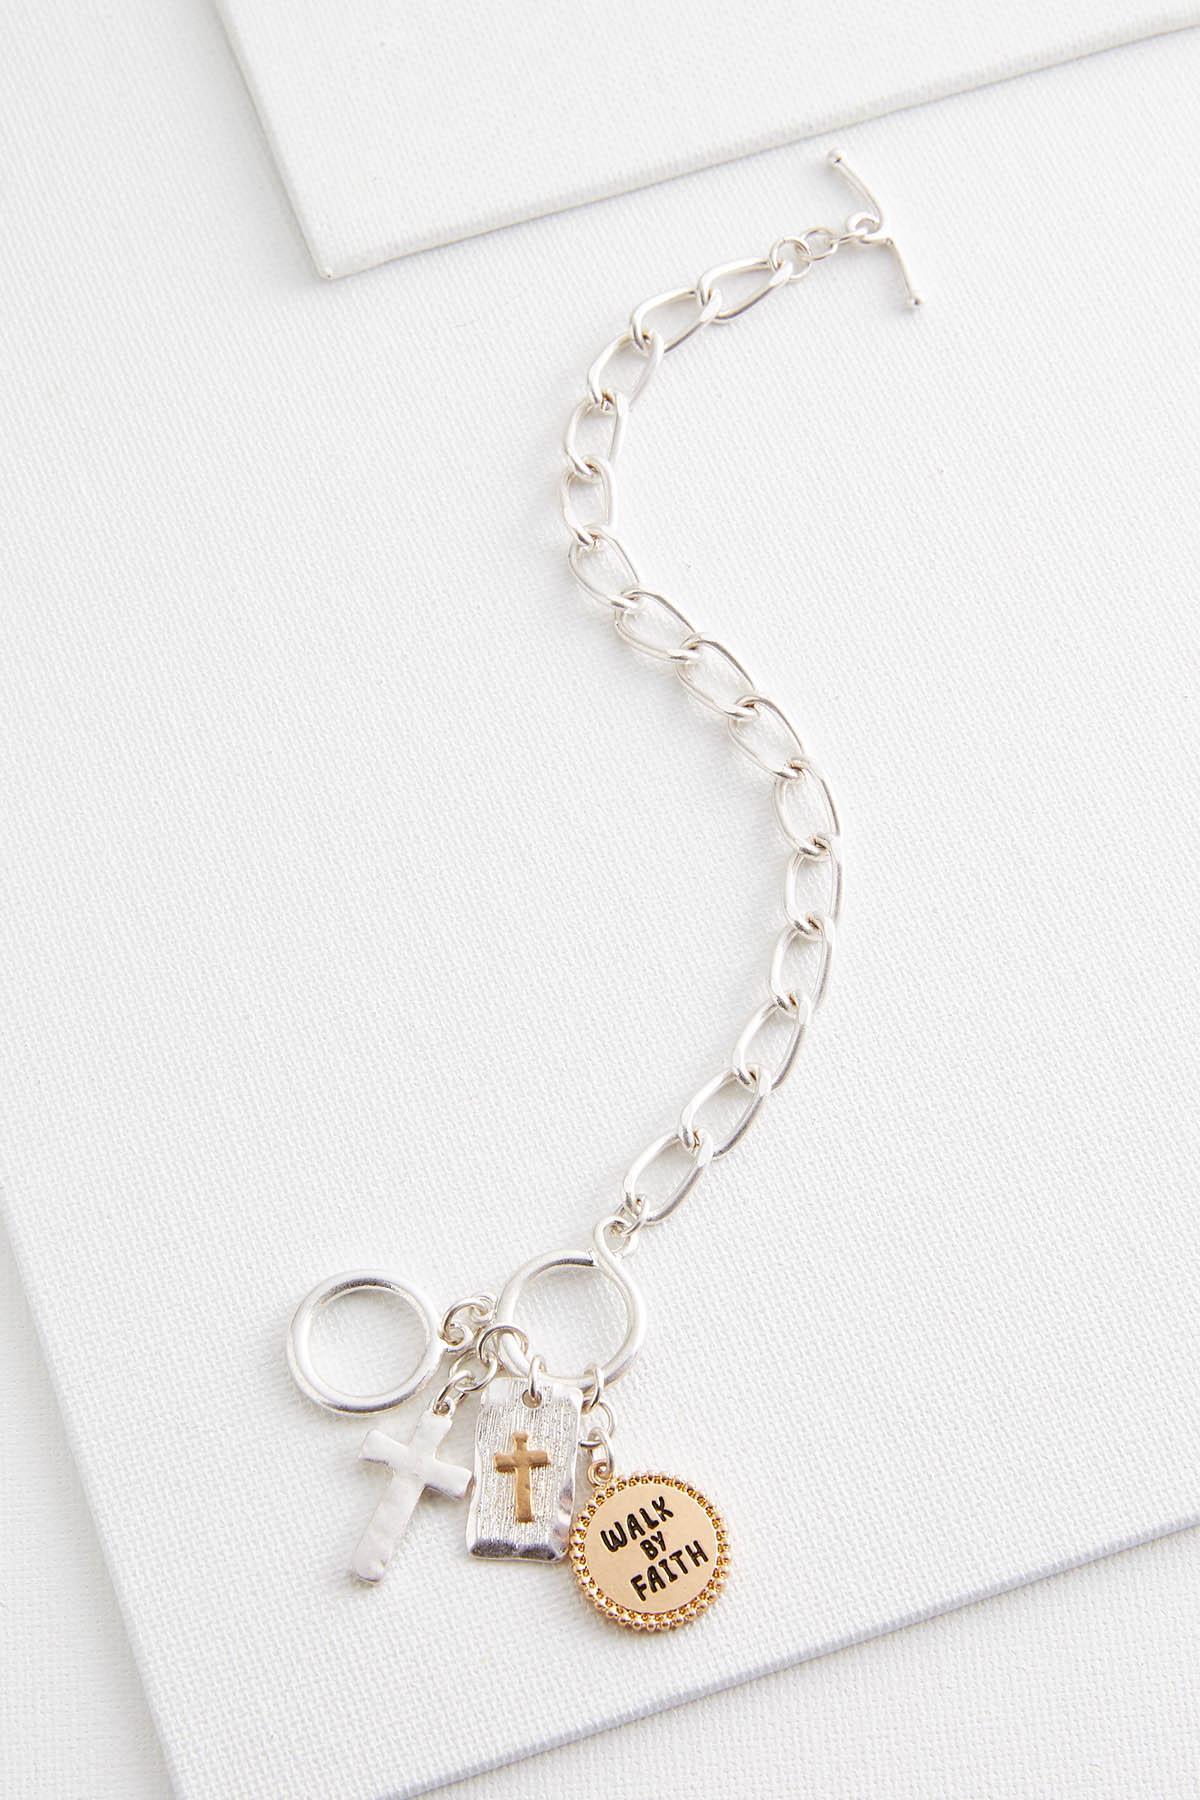 Walk By Faith Cluster Bracelet